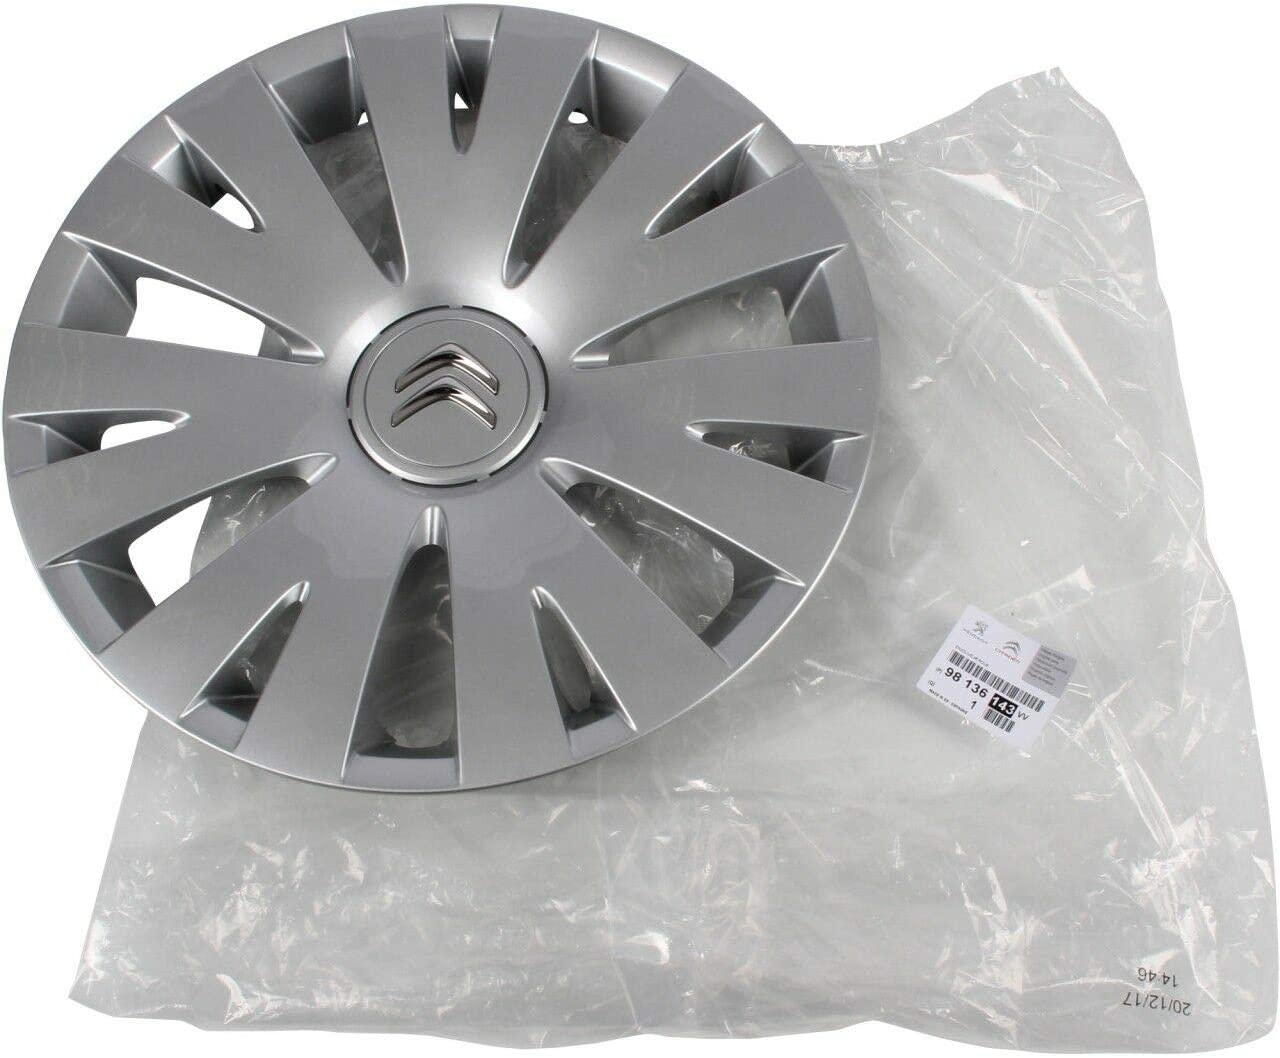 Original Citroen Radkappe Radblende Silber 15 Zoll Feroe 98136143vv Berlingo B9 Auto